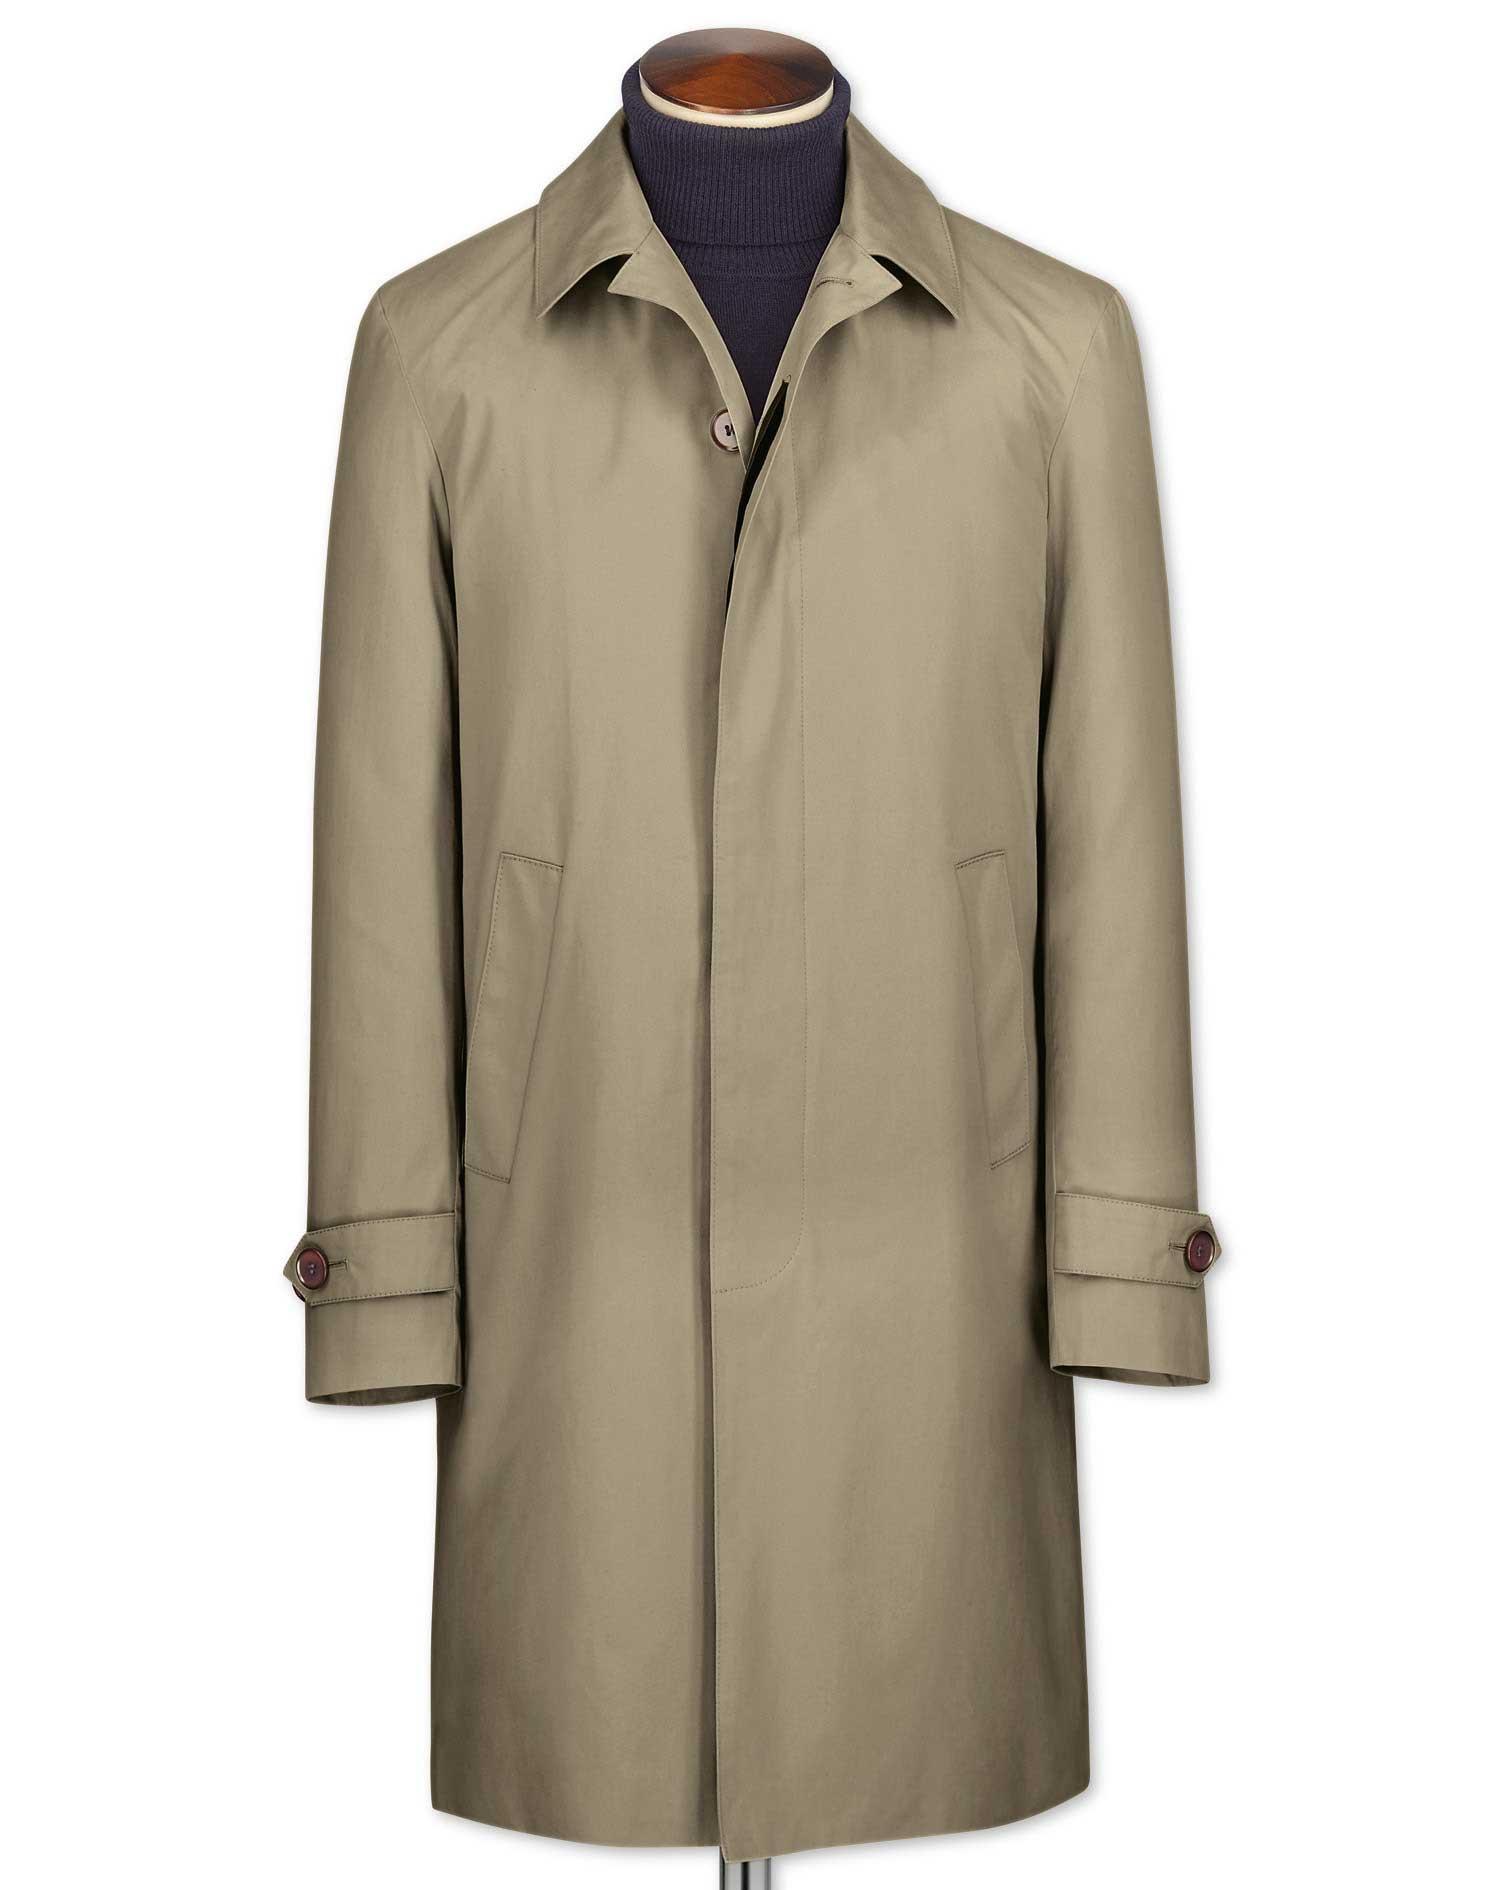 Men's Luxury Coats & Outerwear | Charles Tyrwhitt